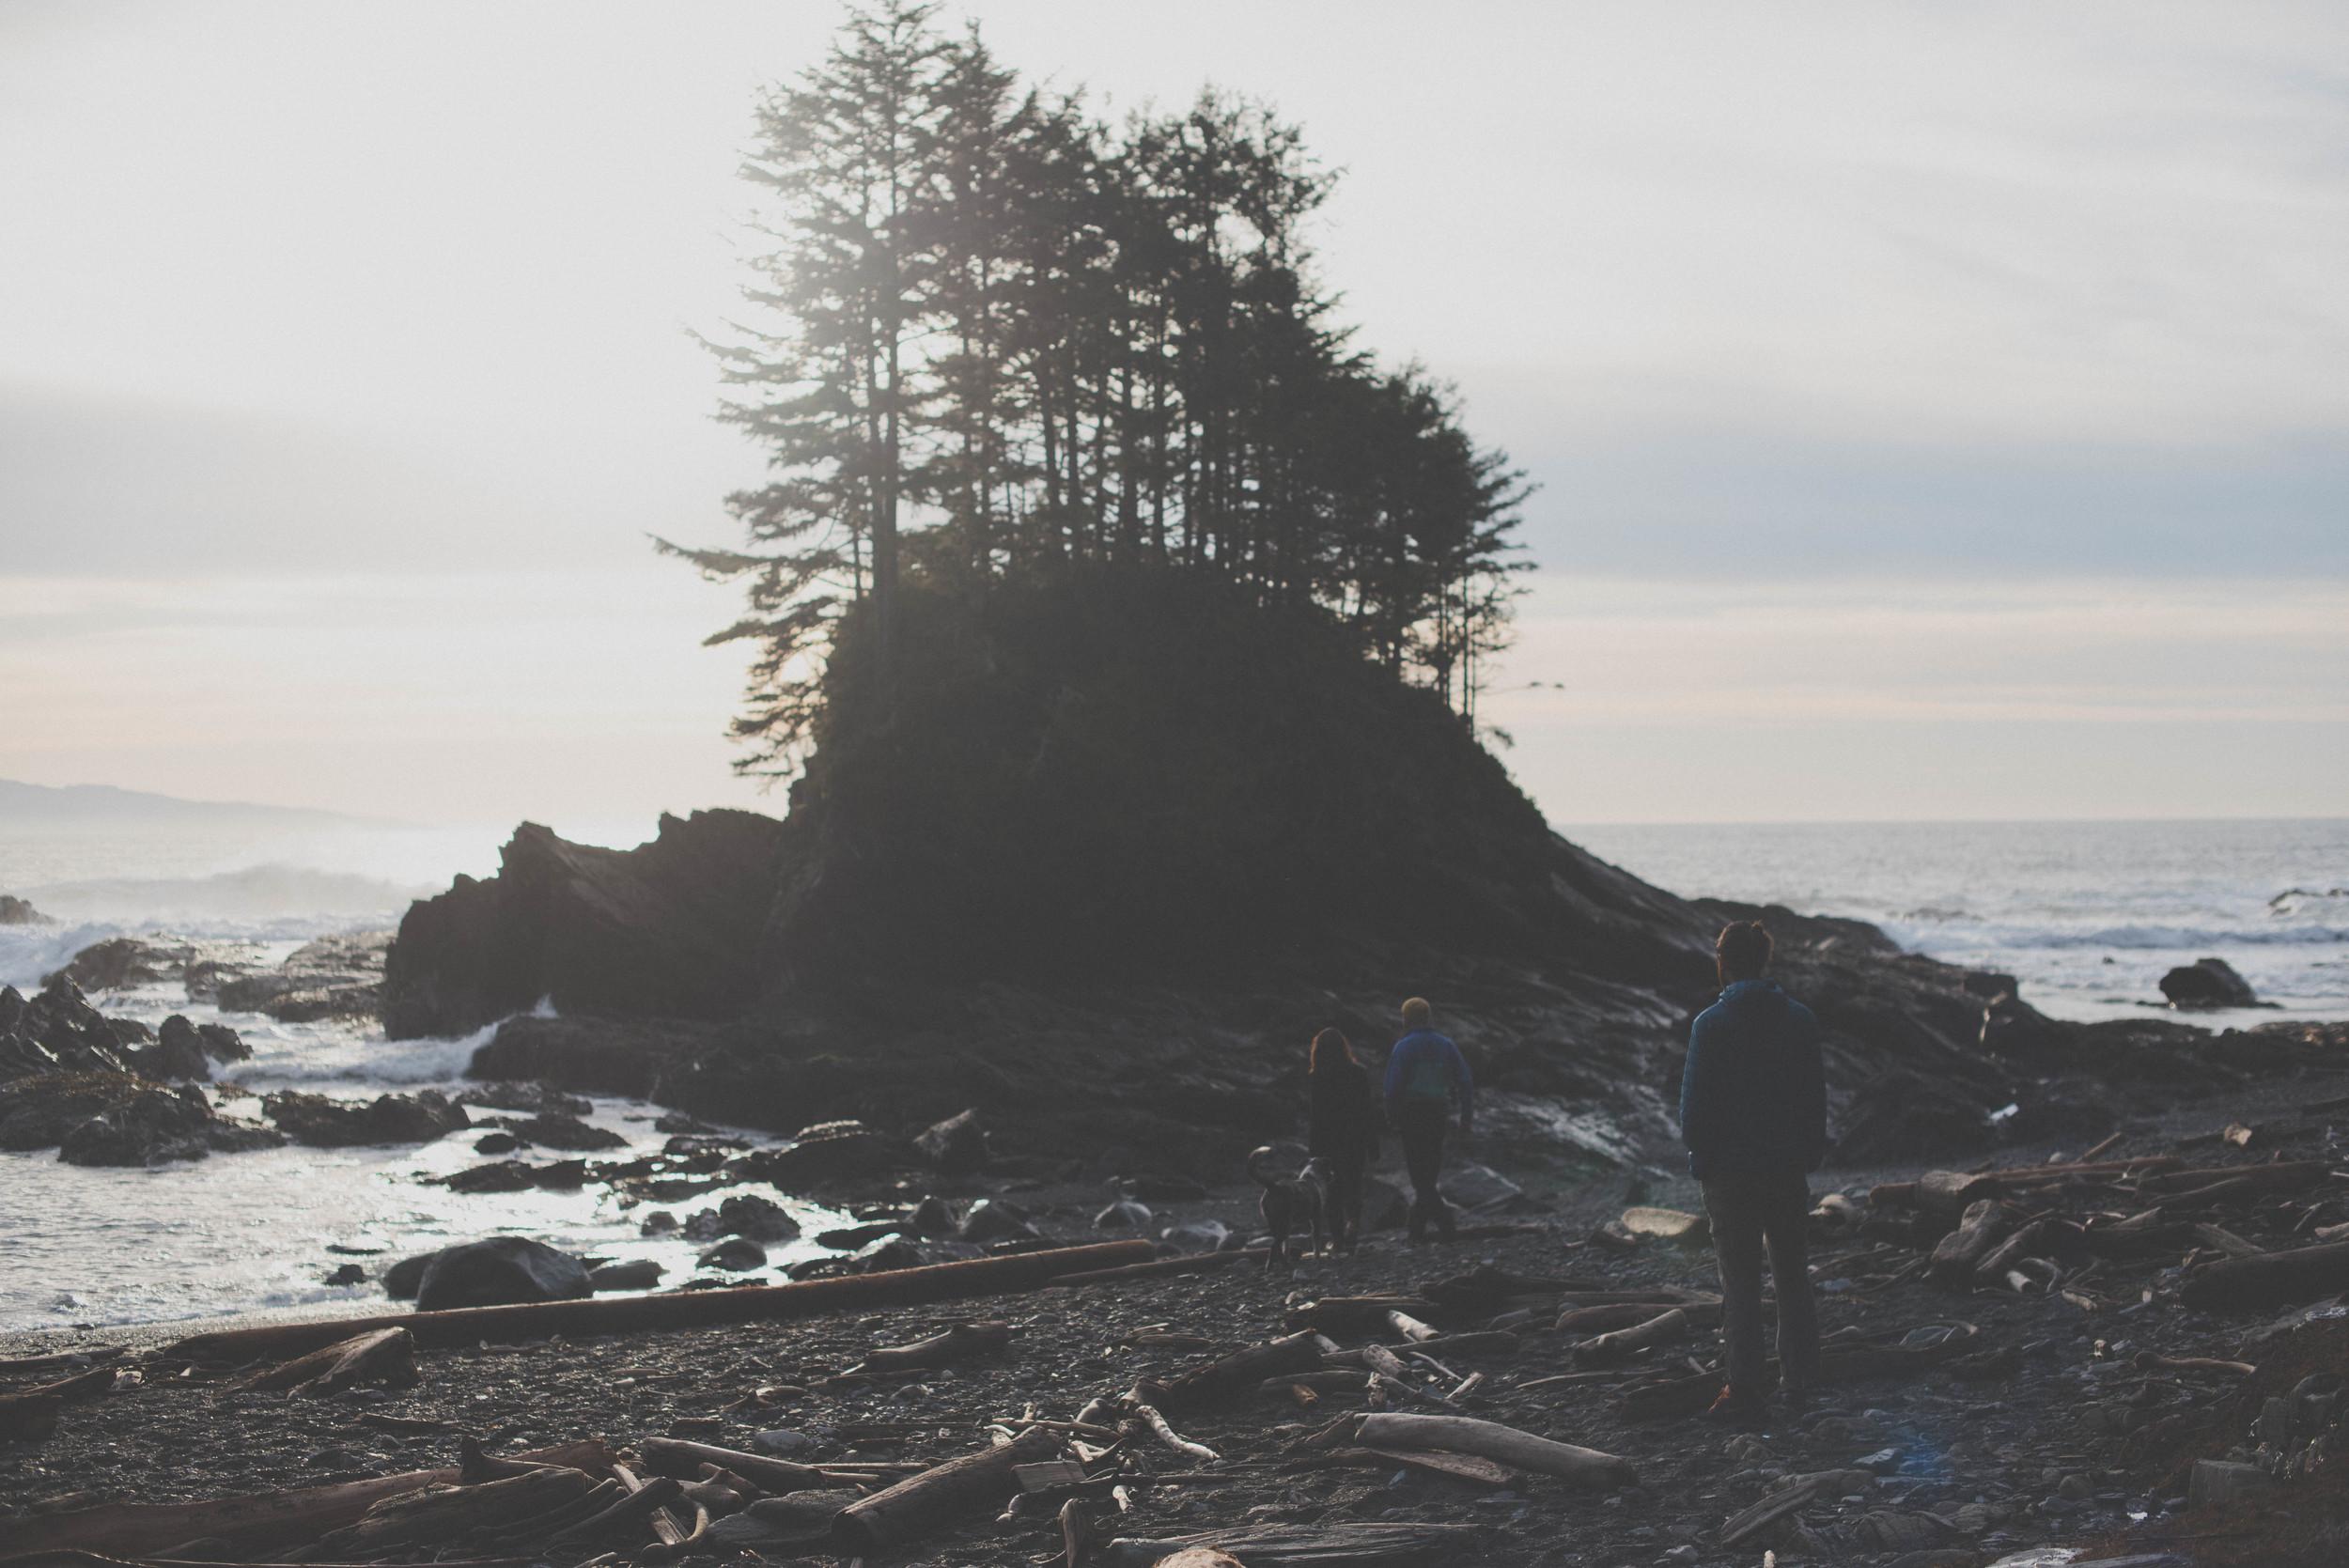 woodsbeach-3325.jpg